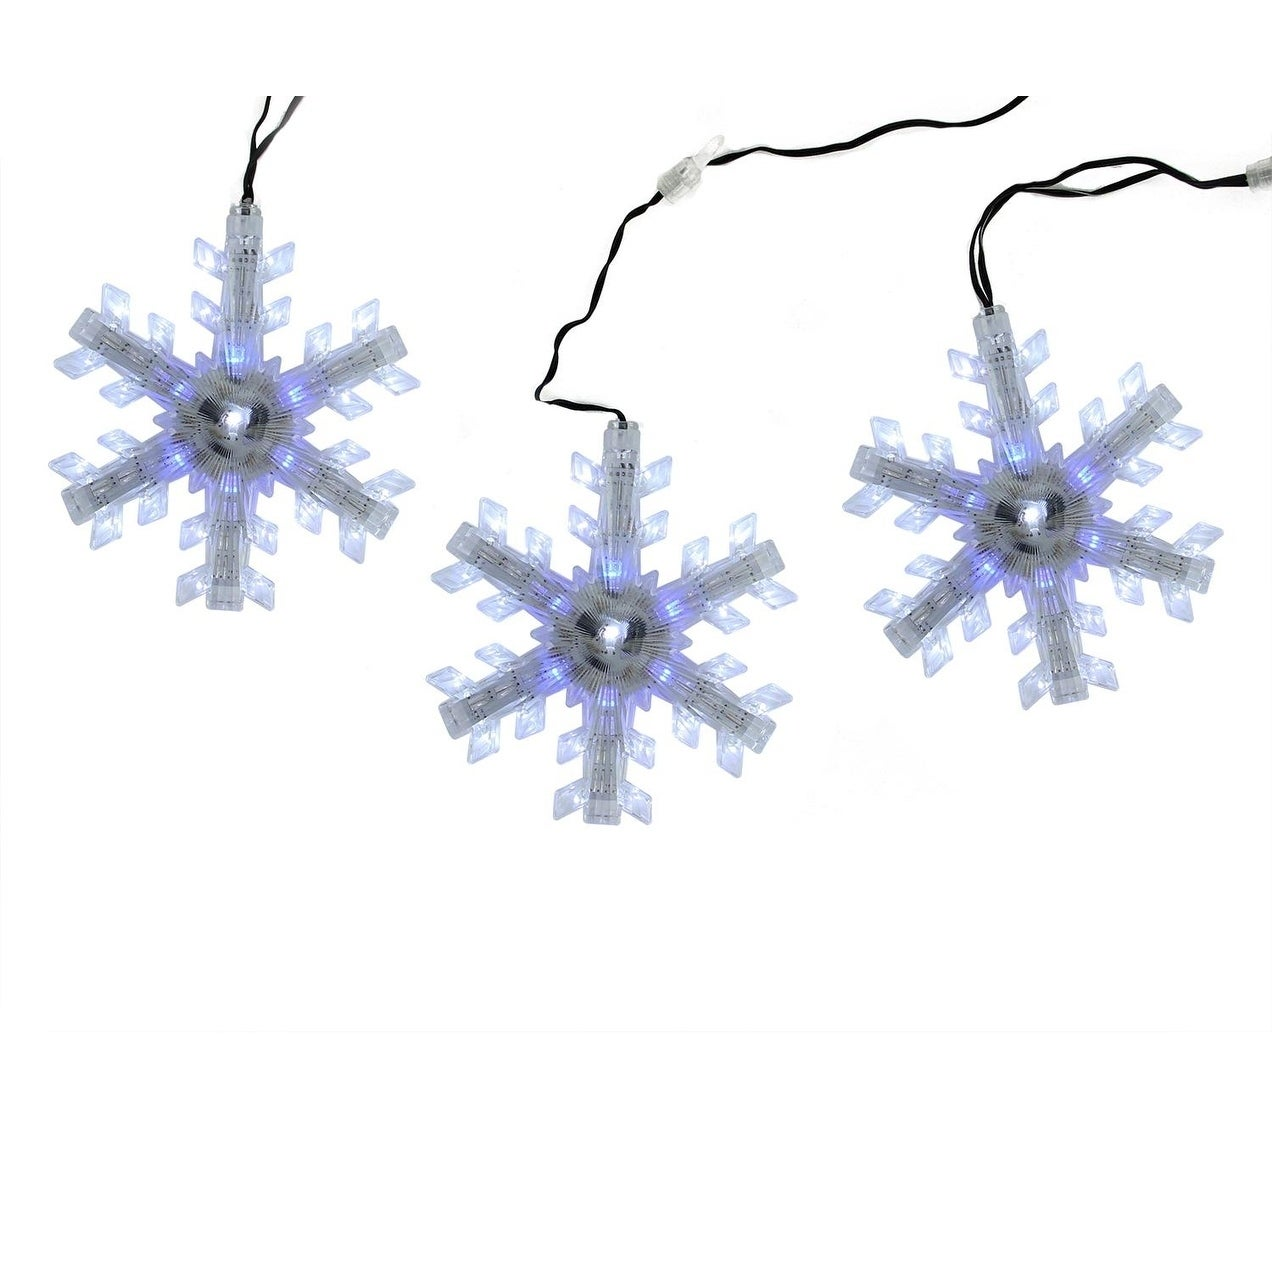 Set of 3 Cascading White and Blue Snowfall LED Snowflake ...